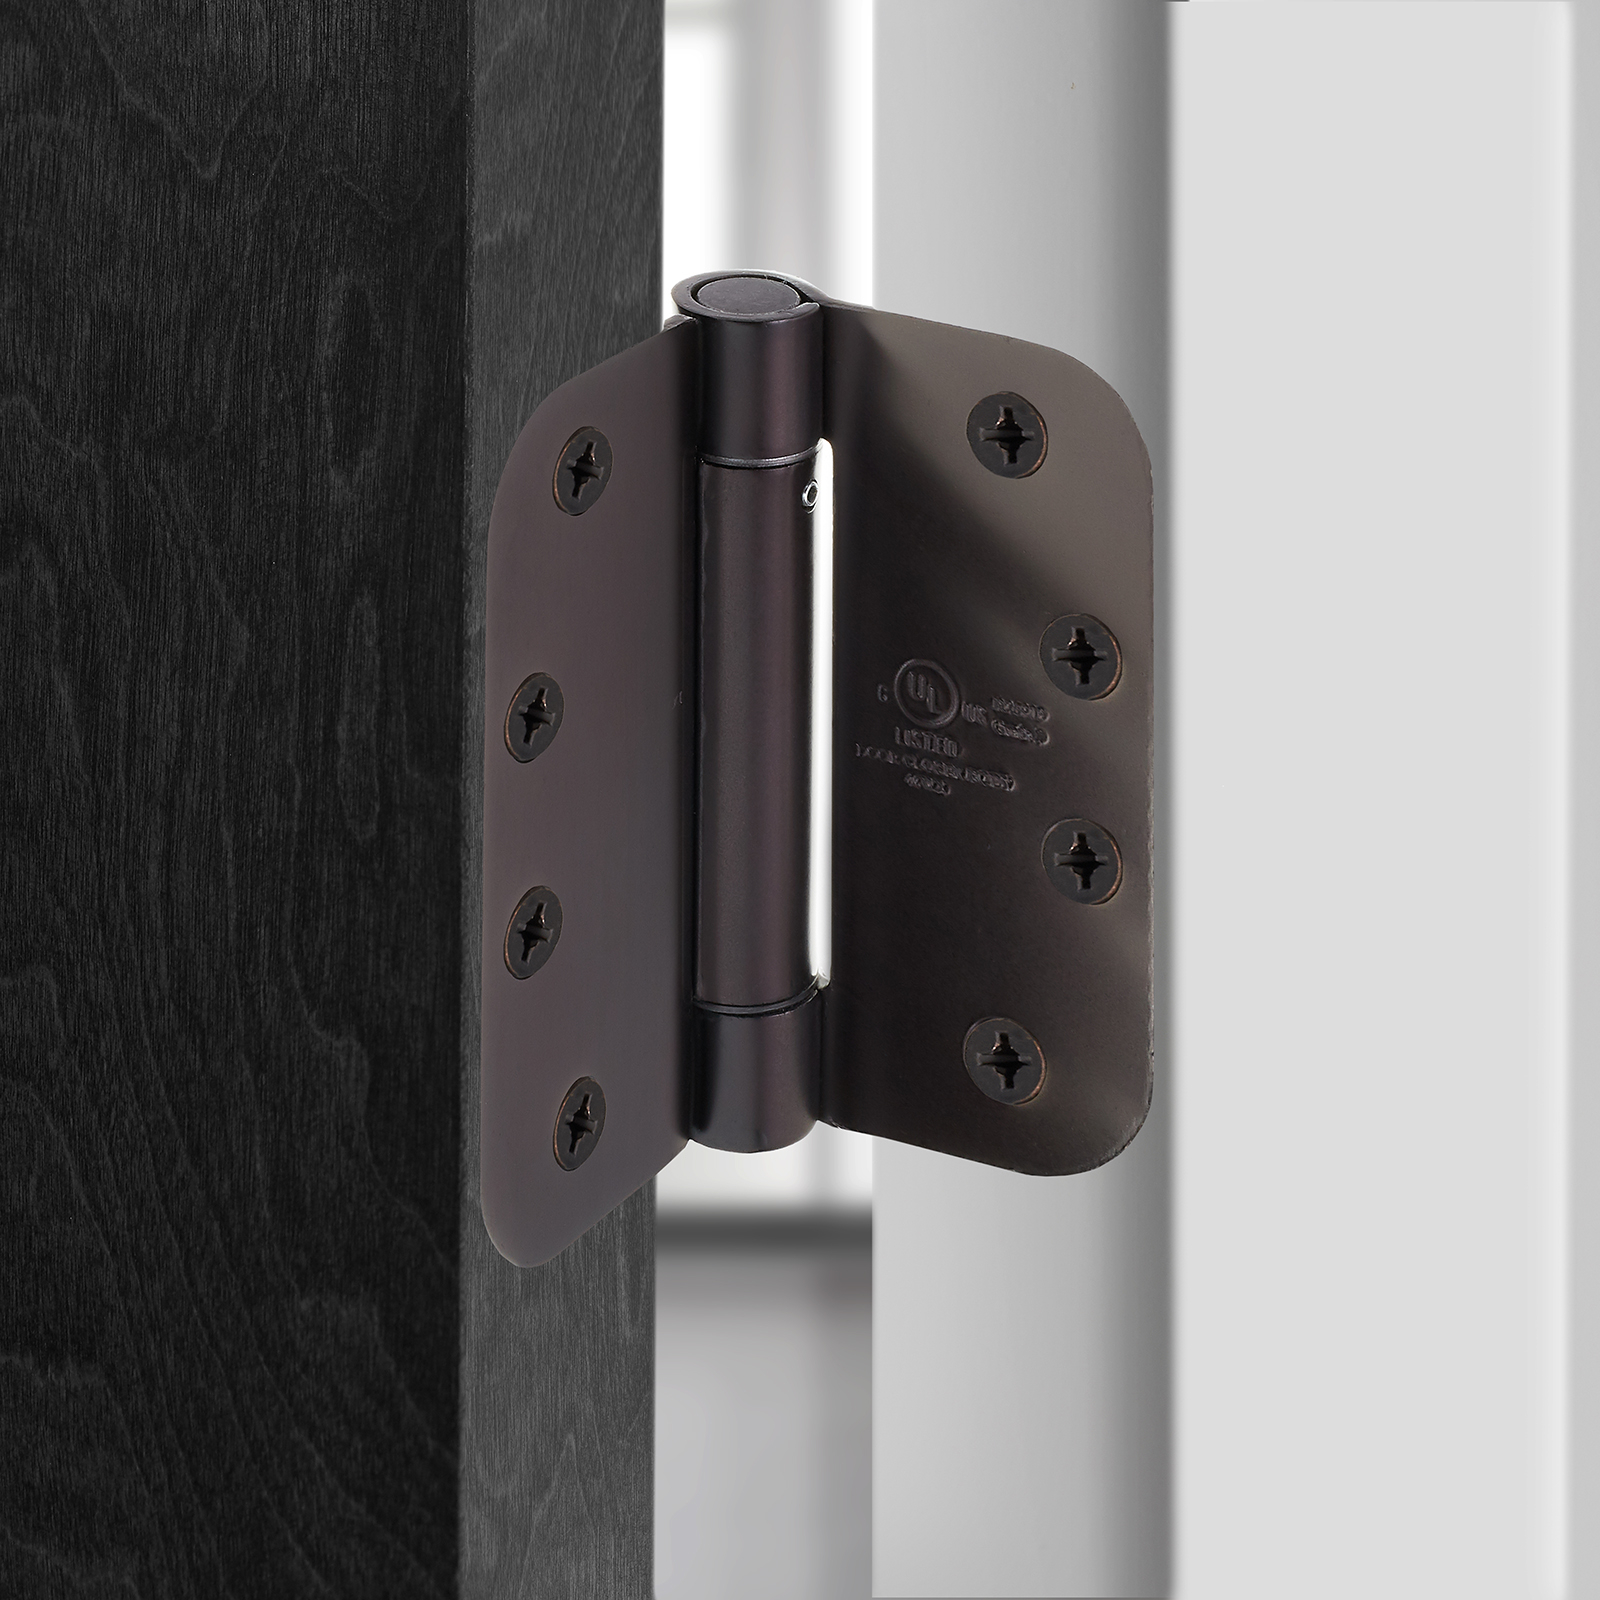 2-Pk-Self-Closing-Spring-Door-Hinge-4-034-x-5-8-034-Radius-UL-Listed thumbnail 13